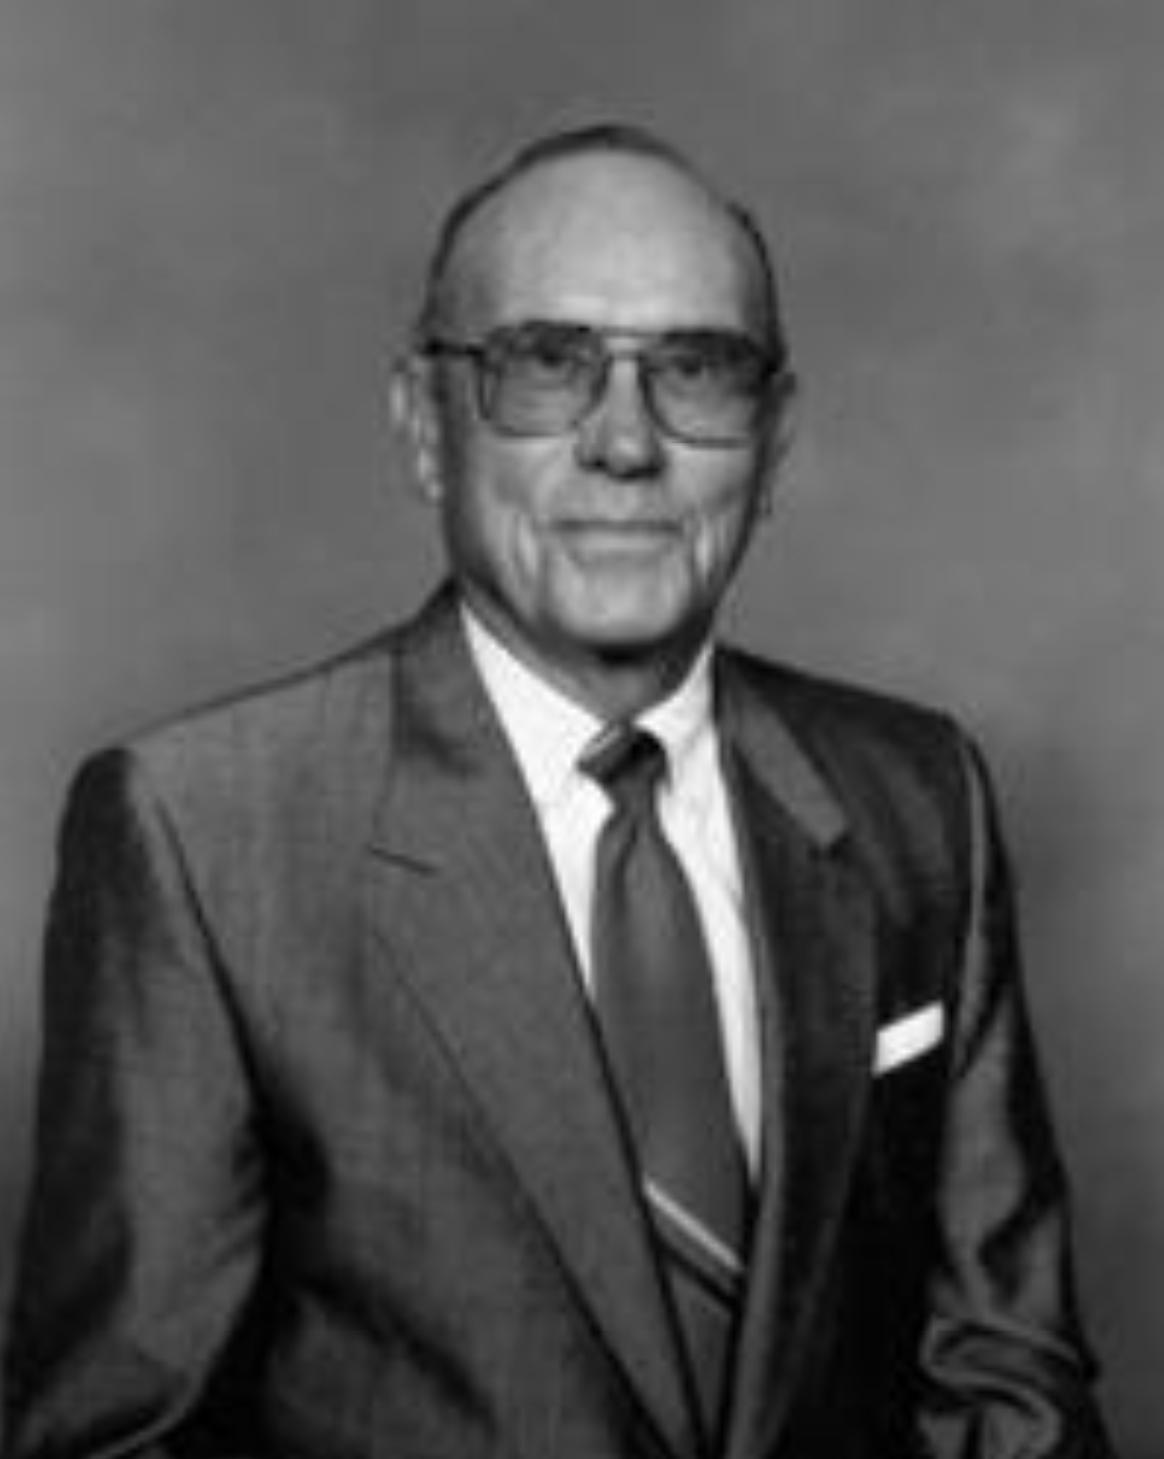 JOHN D. POOLE